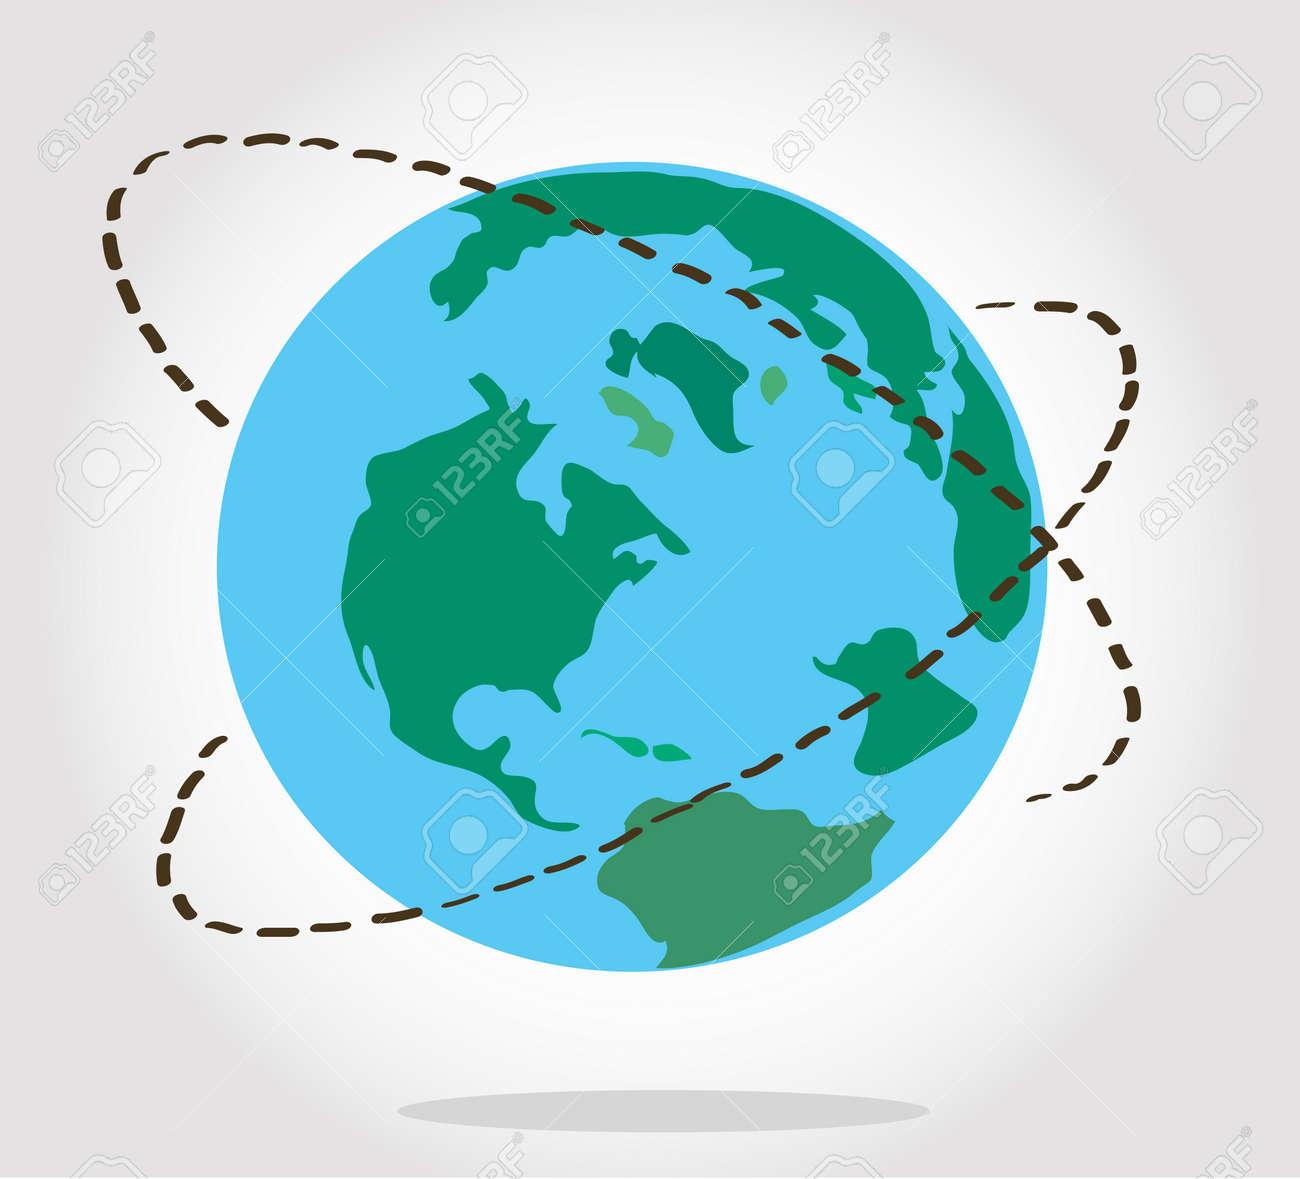 Plane Travel Around The World Symbol Vector Stock